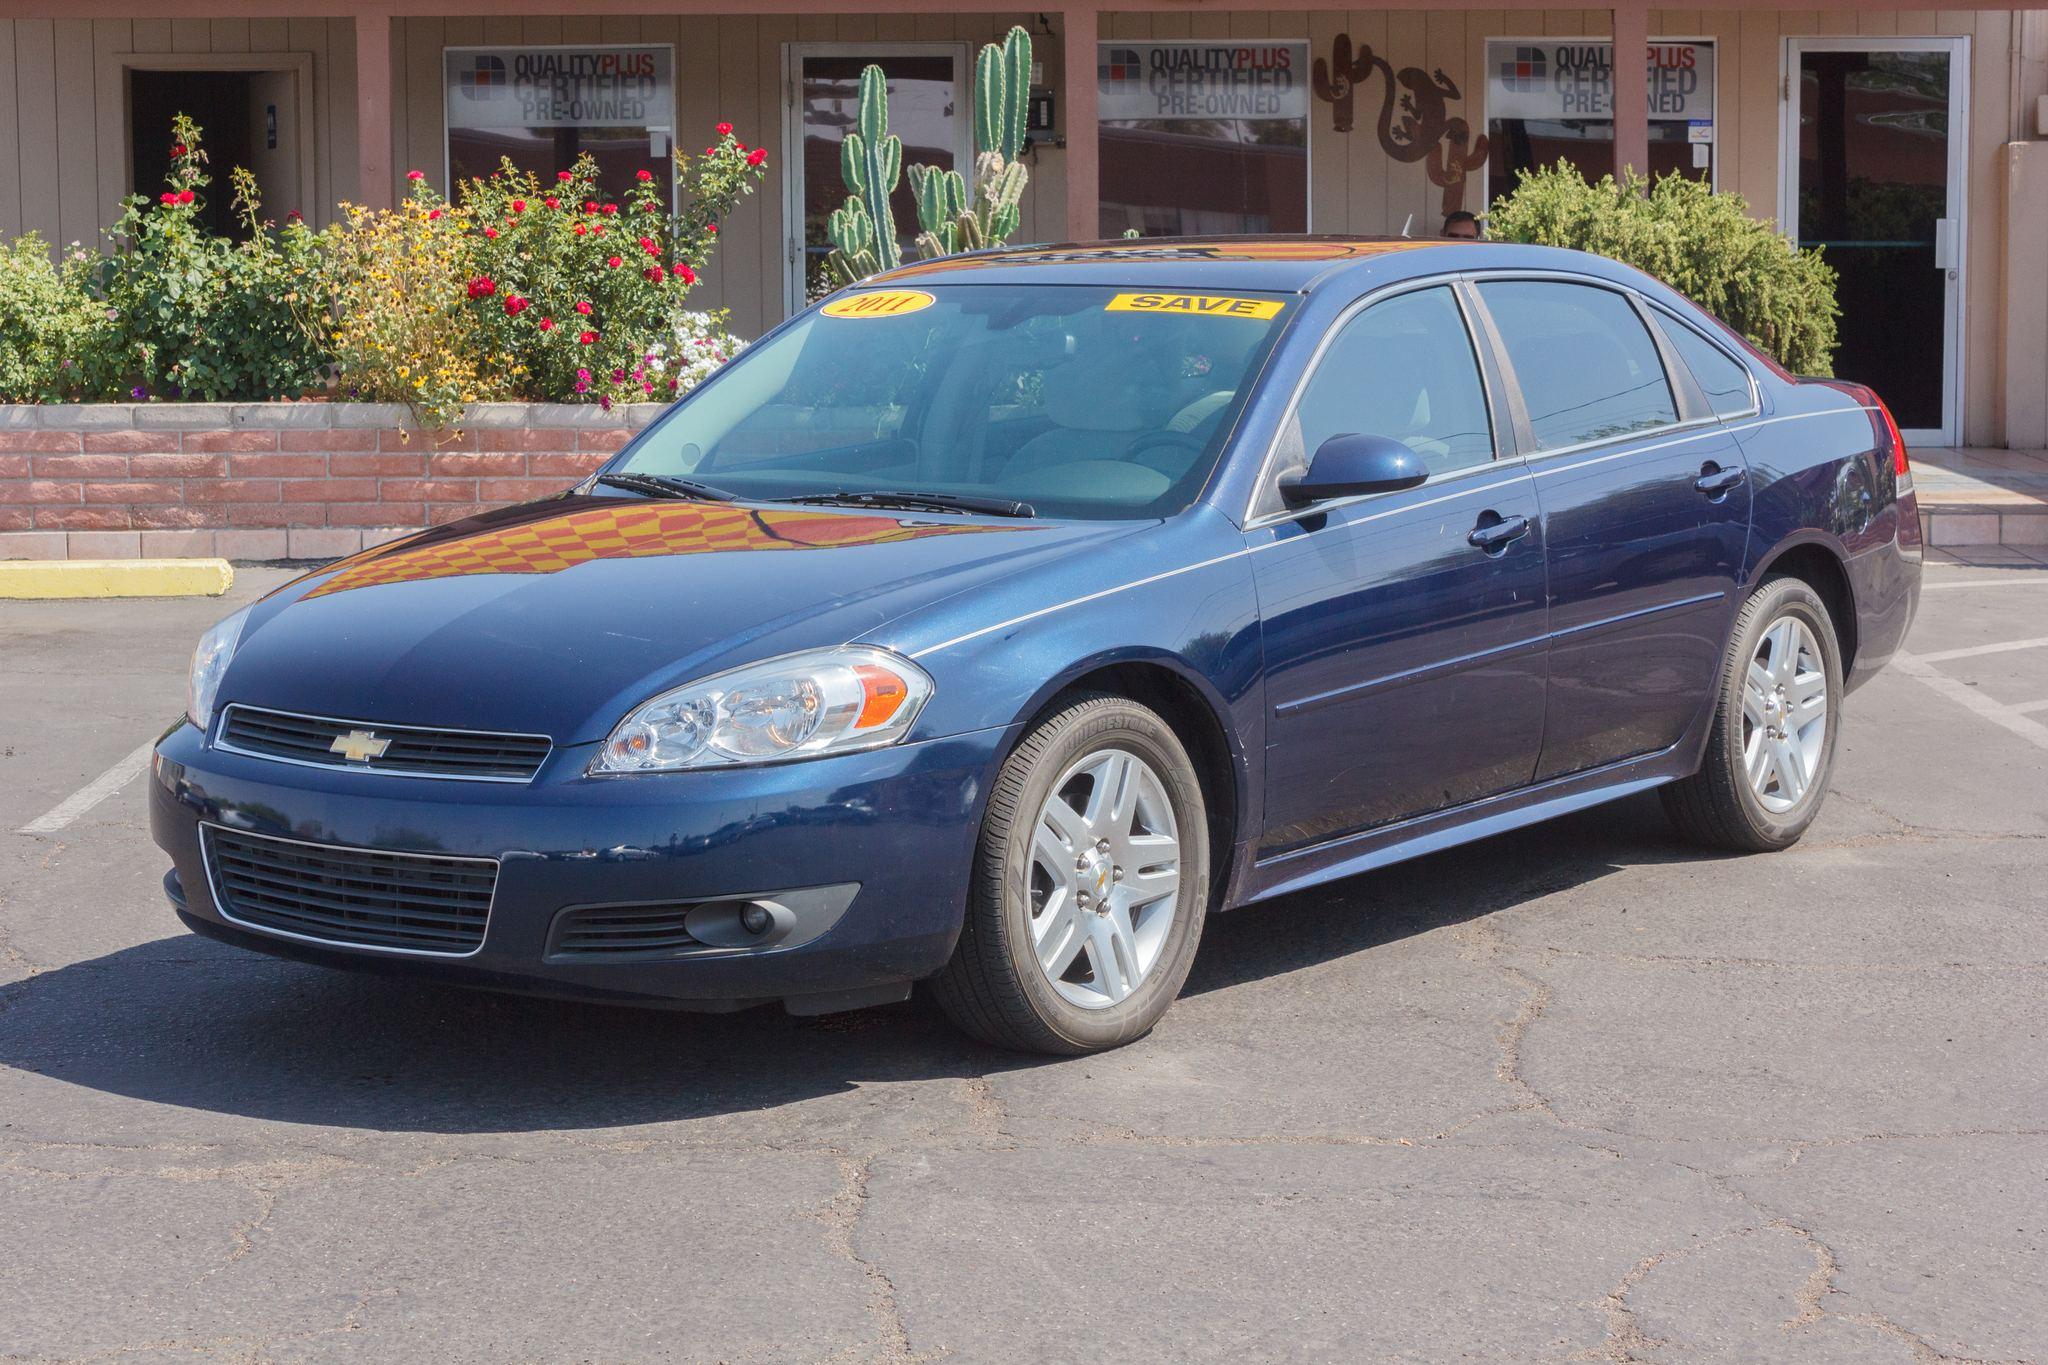 Photo of 2011 Chevrolet Impala 4d Sedan LT Imperial Blue Metallic